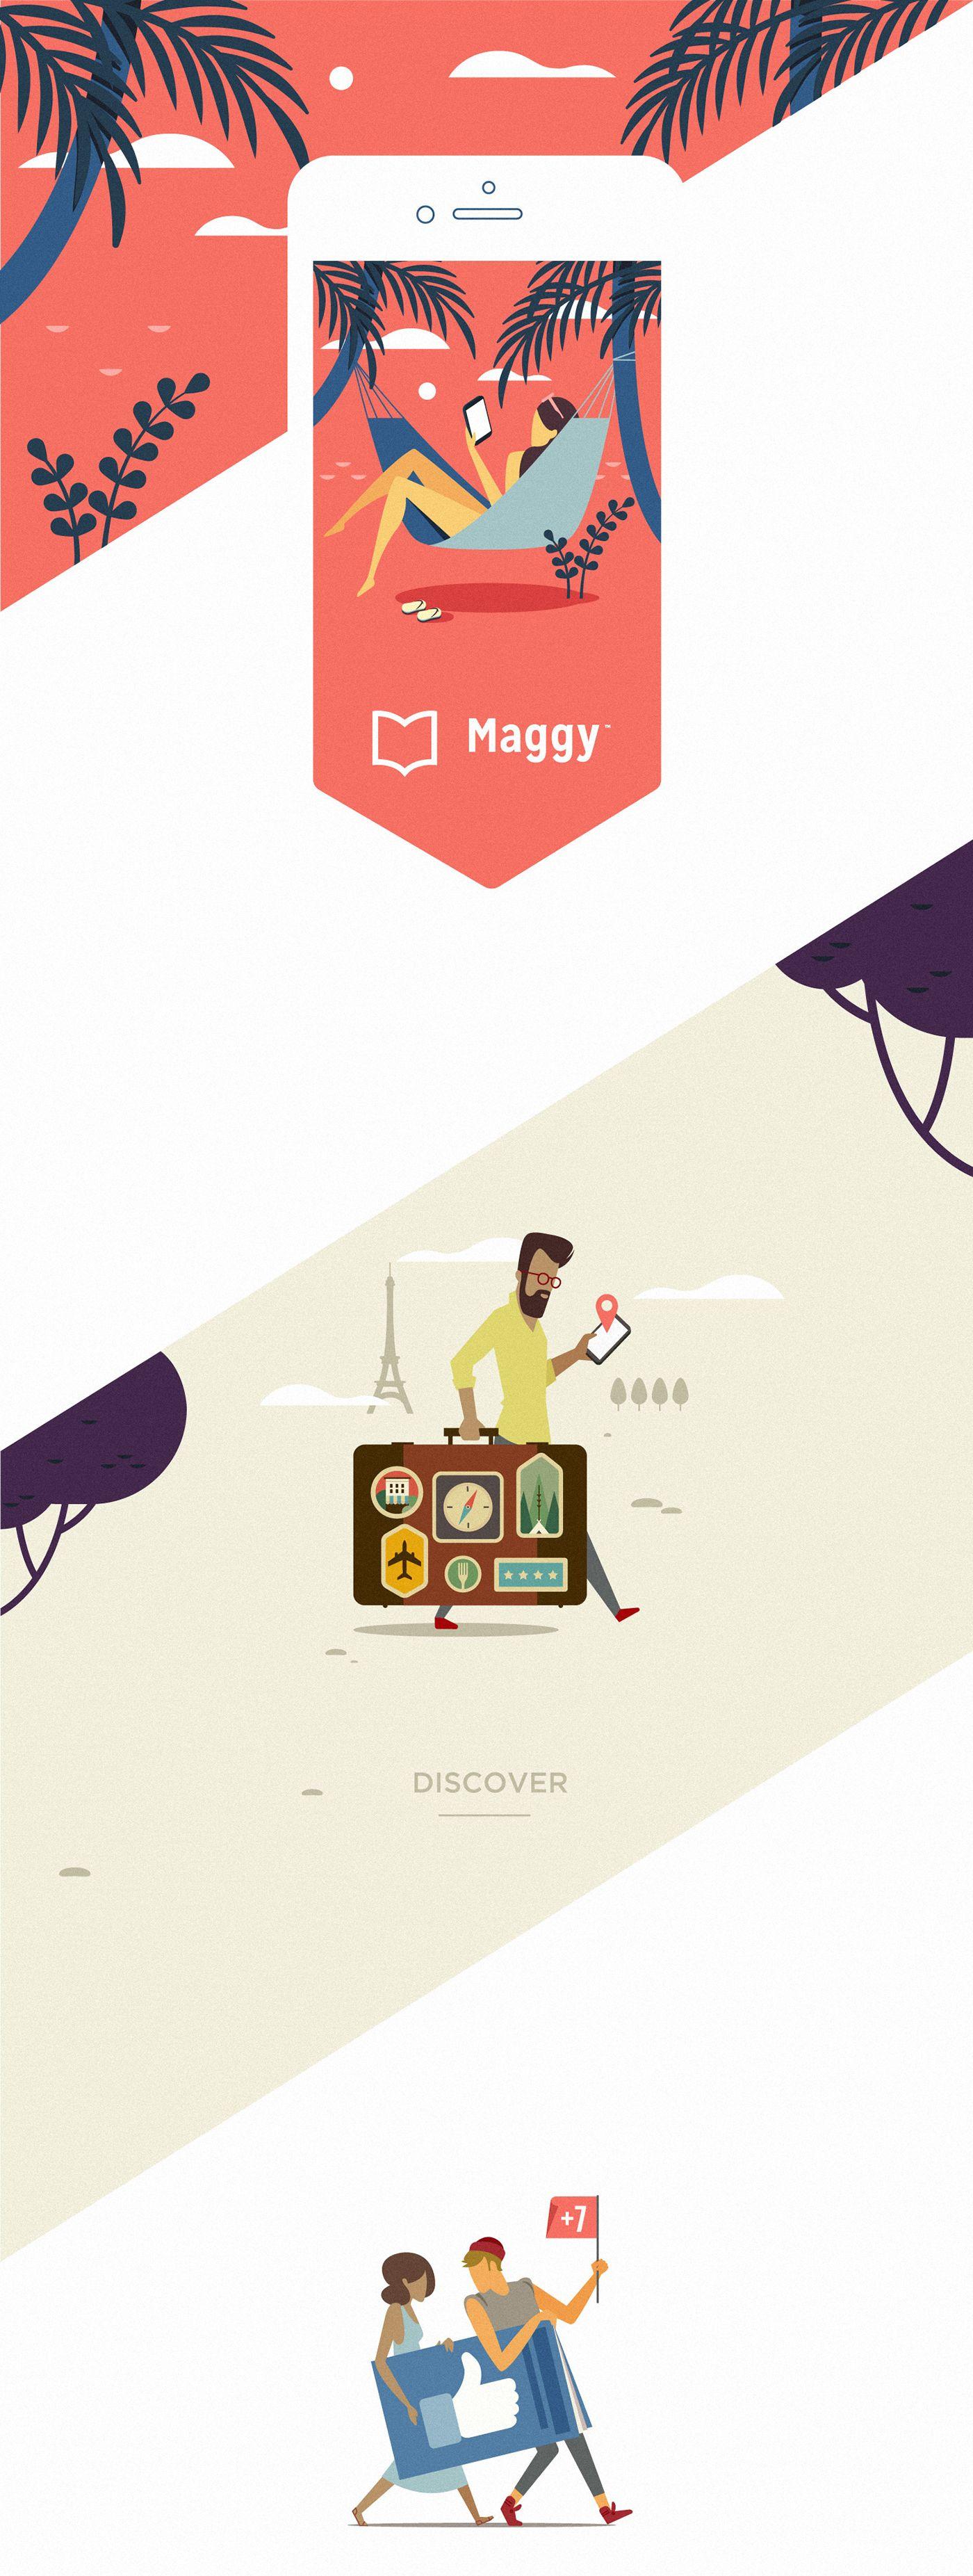 MAGGY. Magazines app. Illustrations on Behance